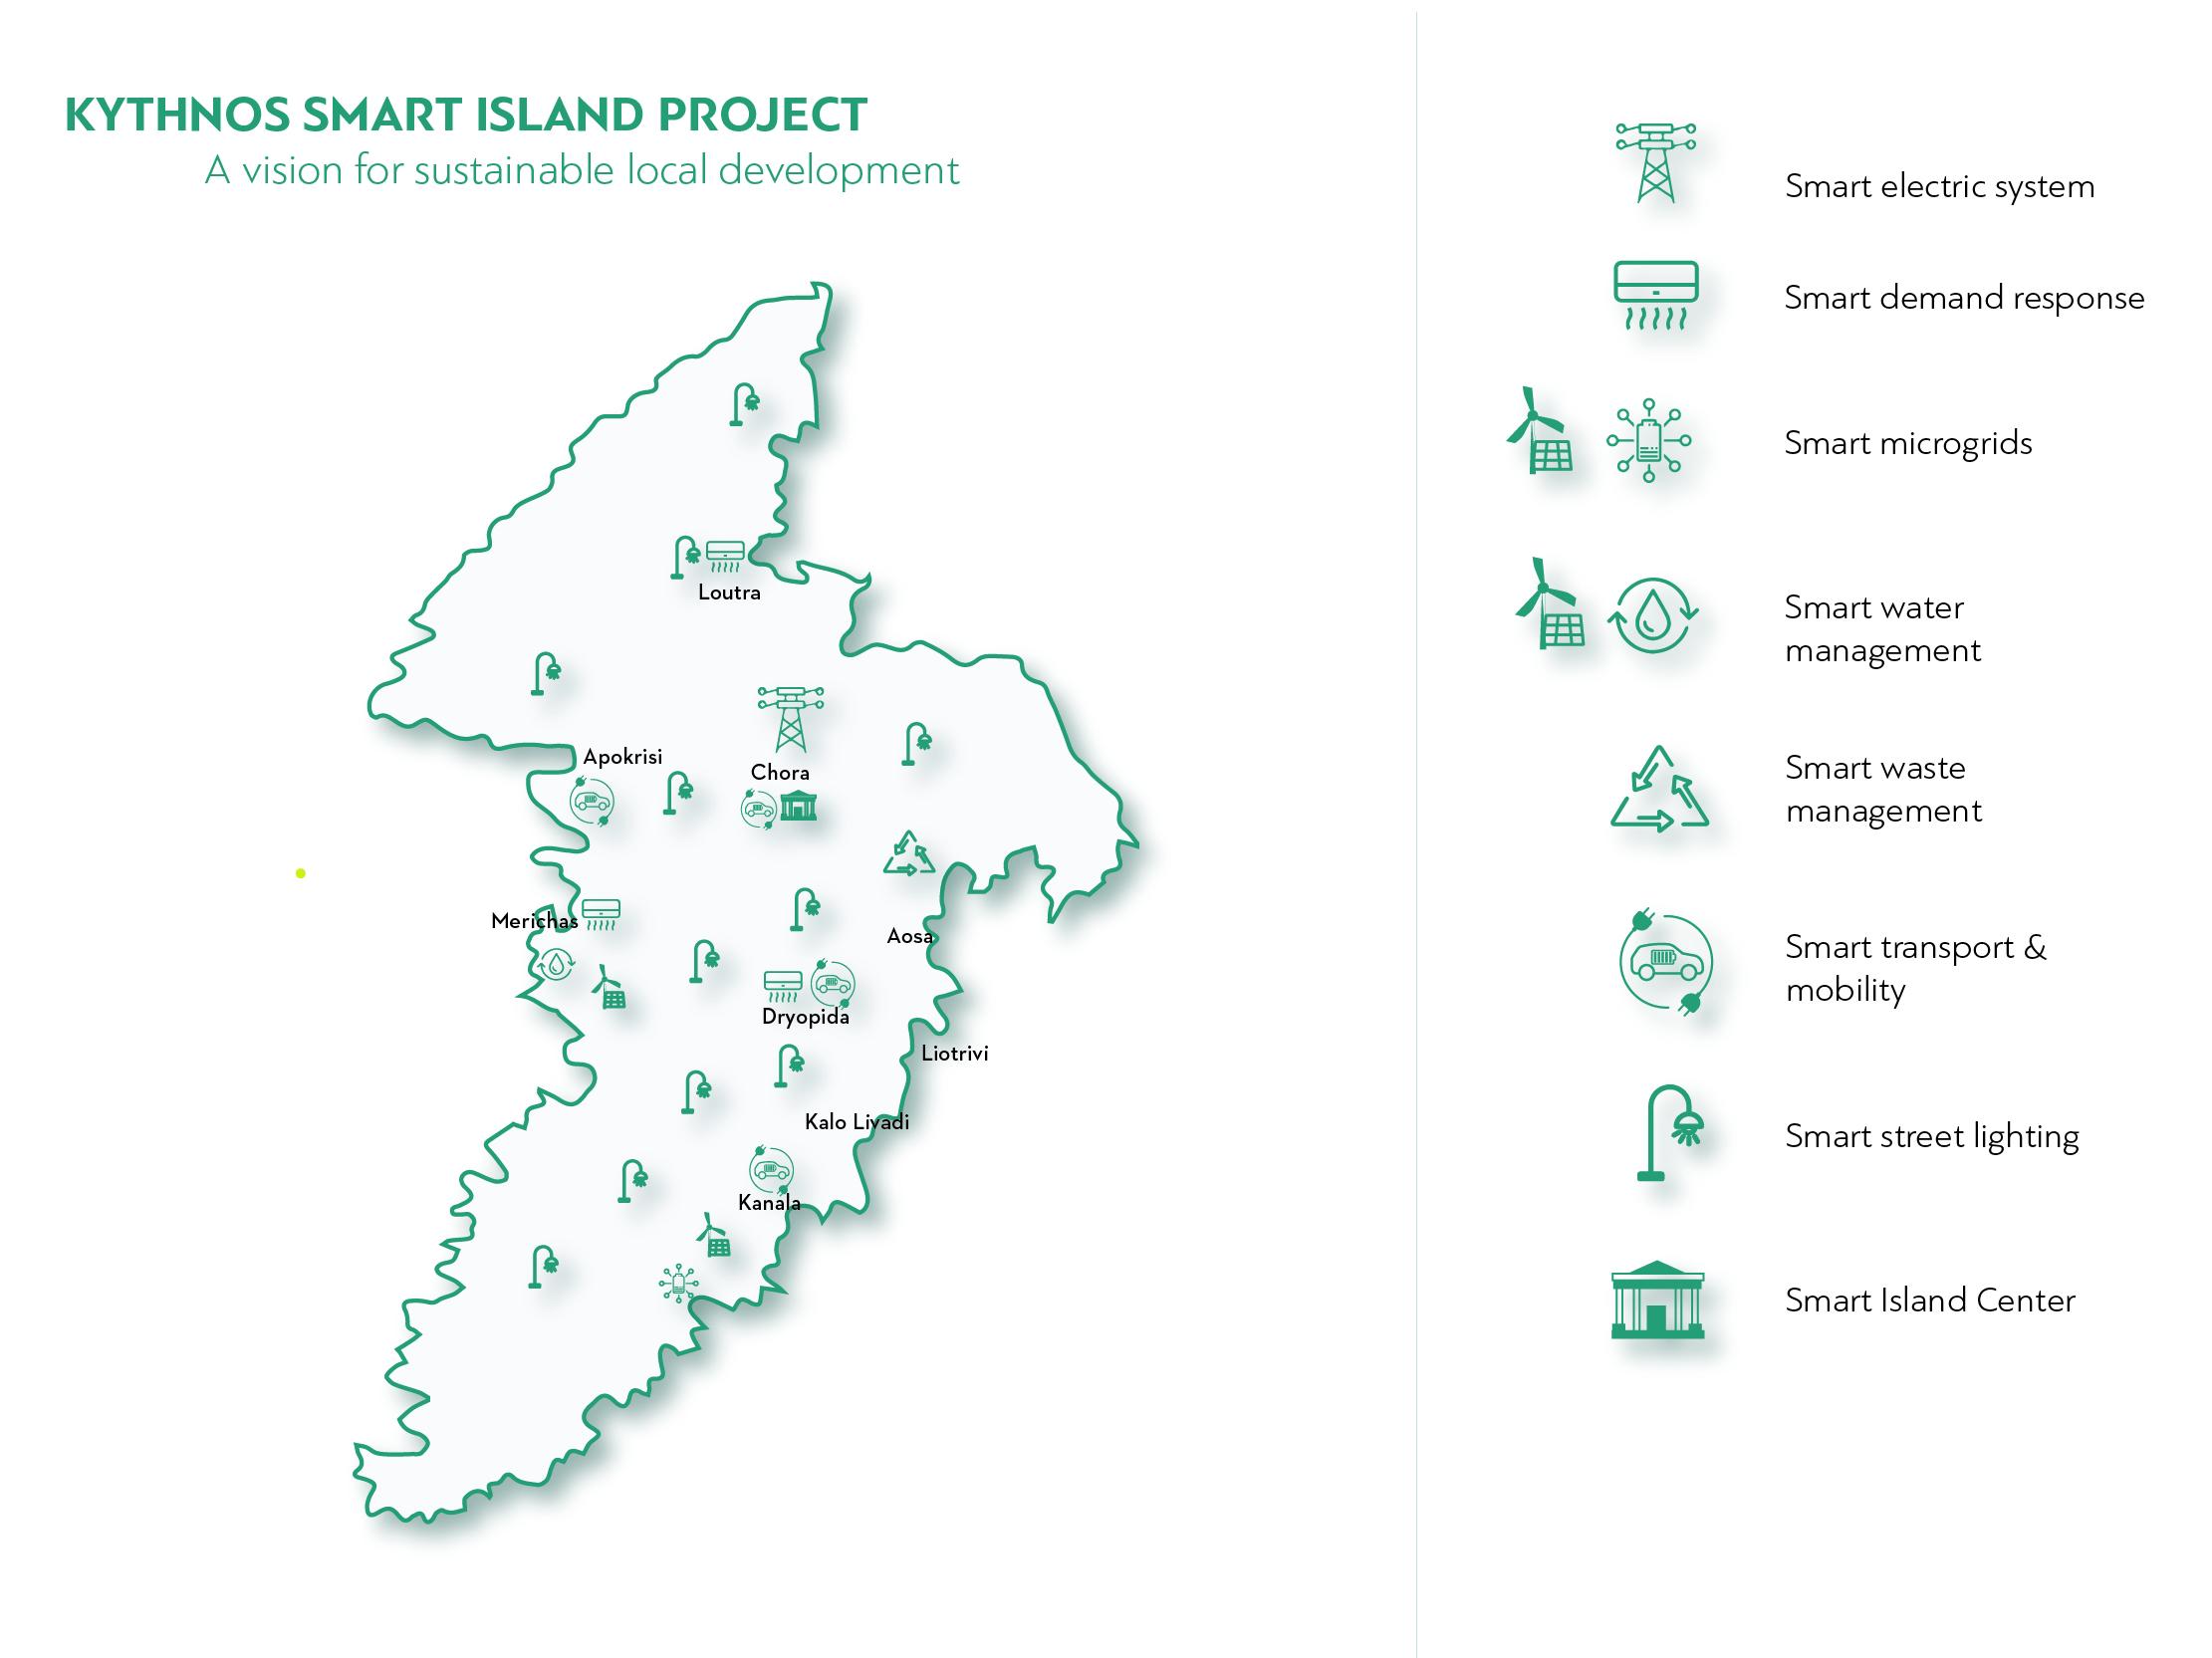 Kythnos Smart Island